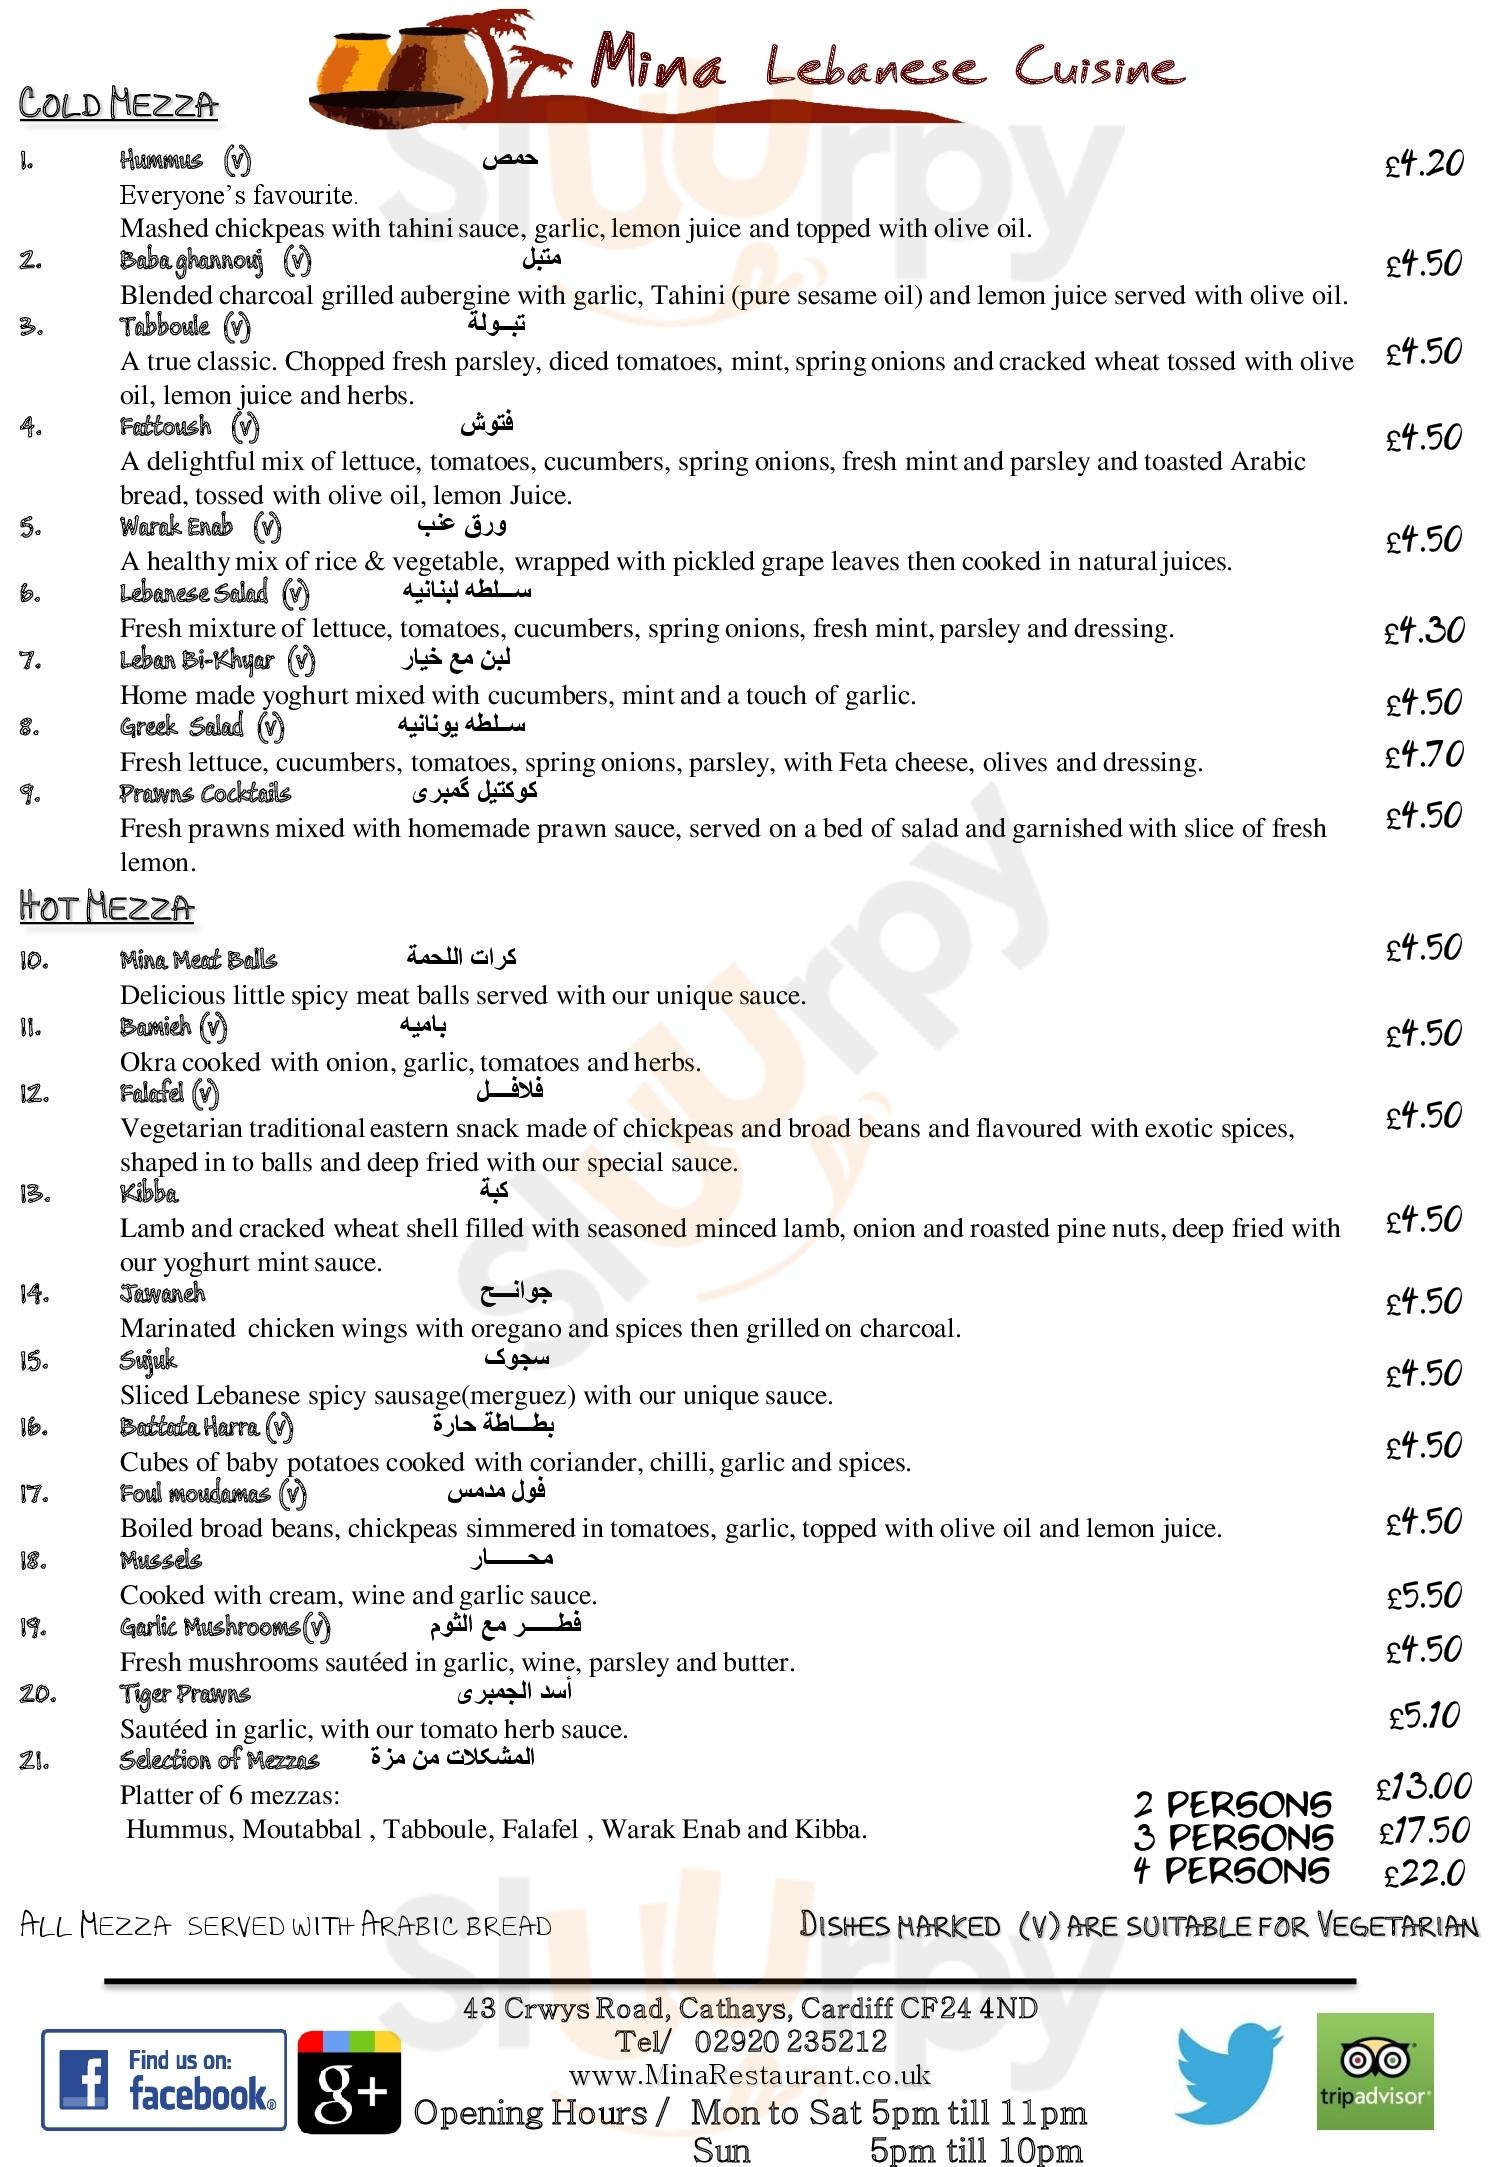 Mina Restaurant Cardiff menu - page 1